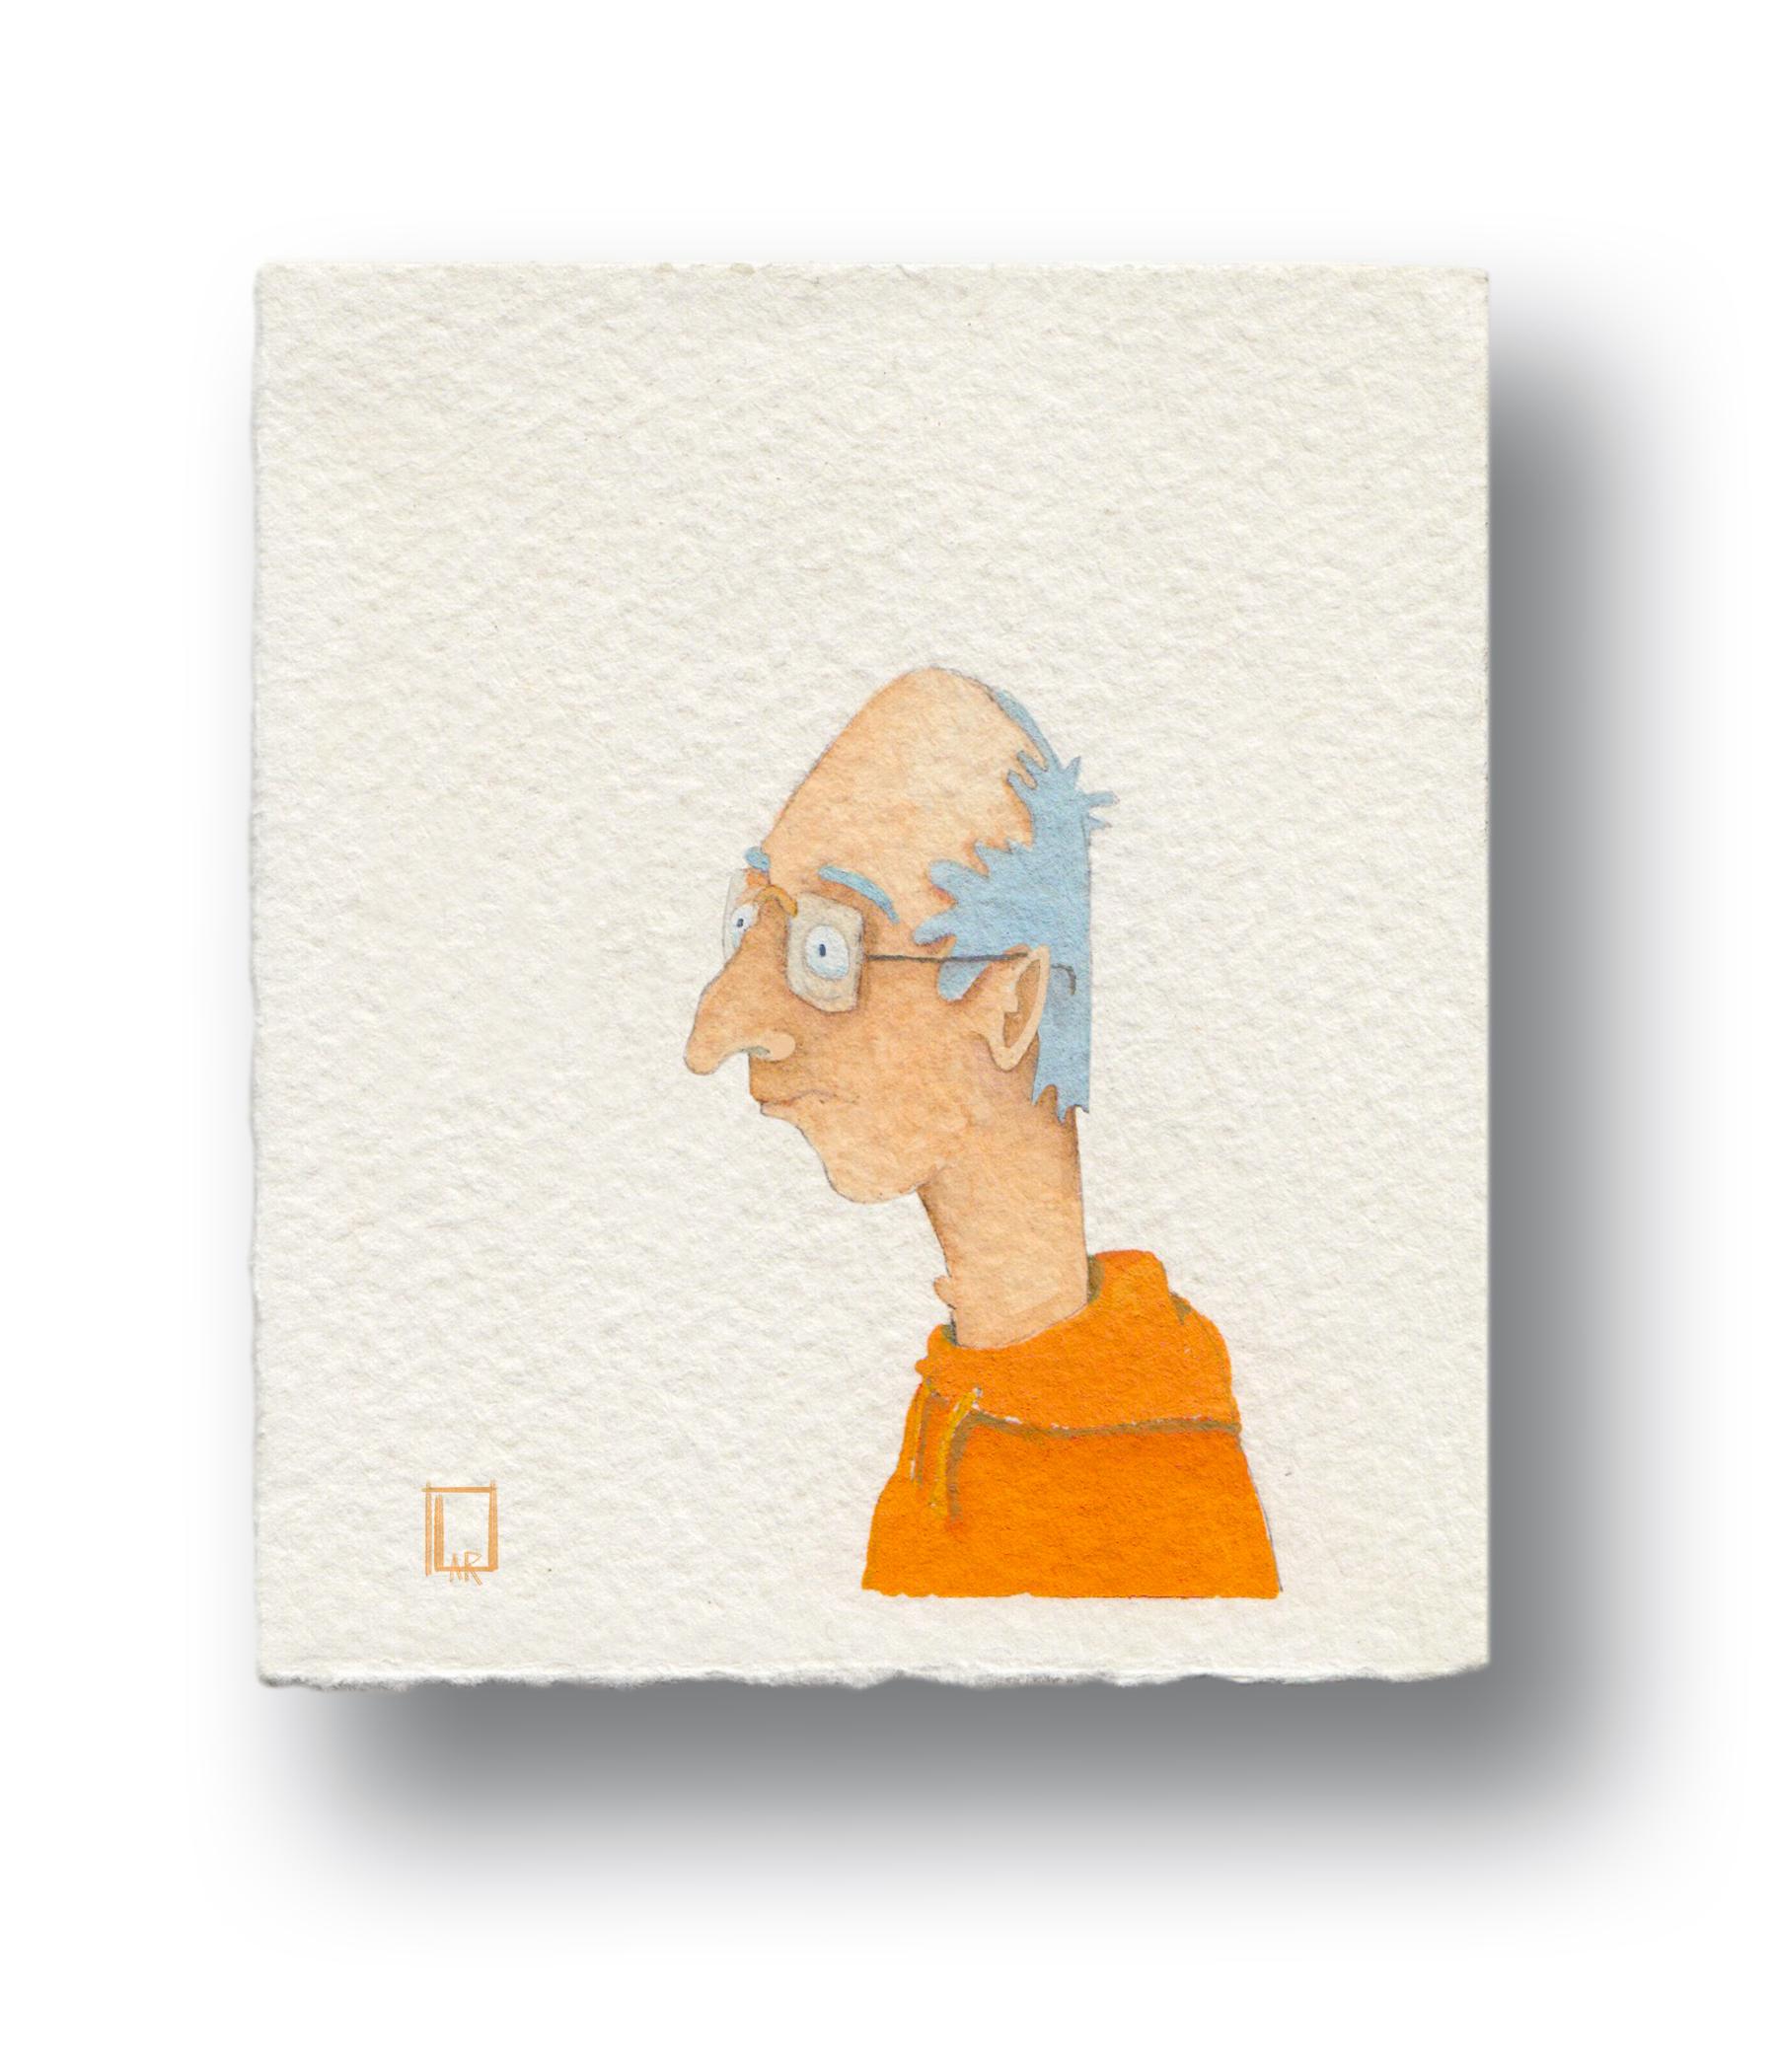 "Orange Sweatshirt Guy  Gouache & Watercolor  3.5 x 4"""